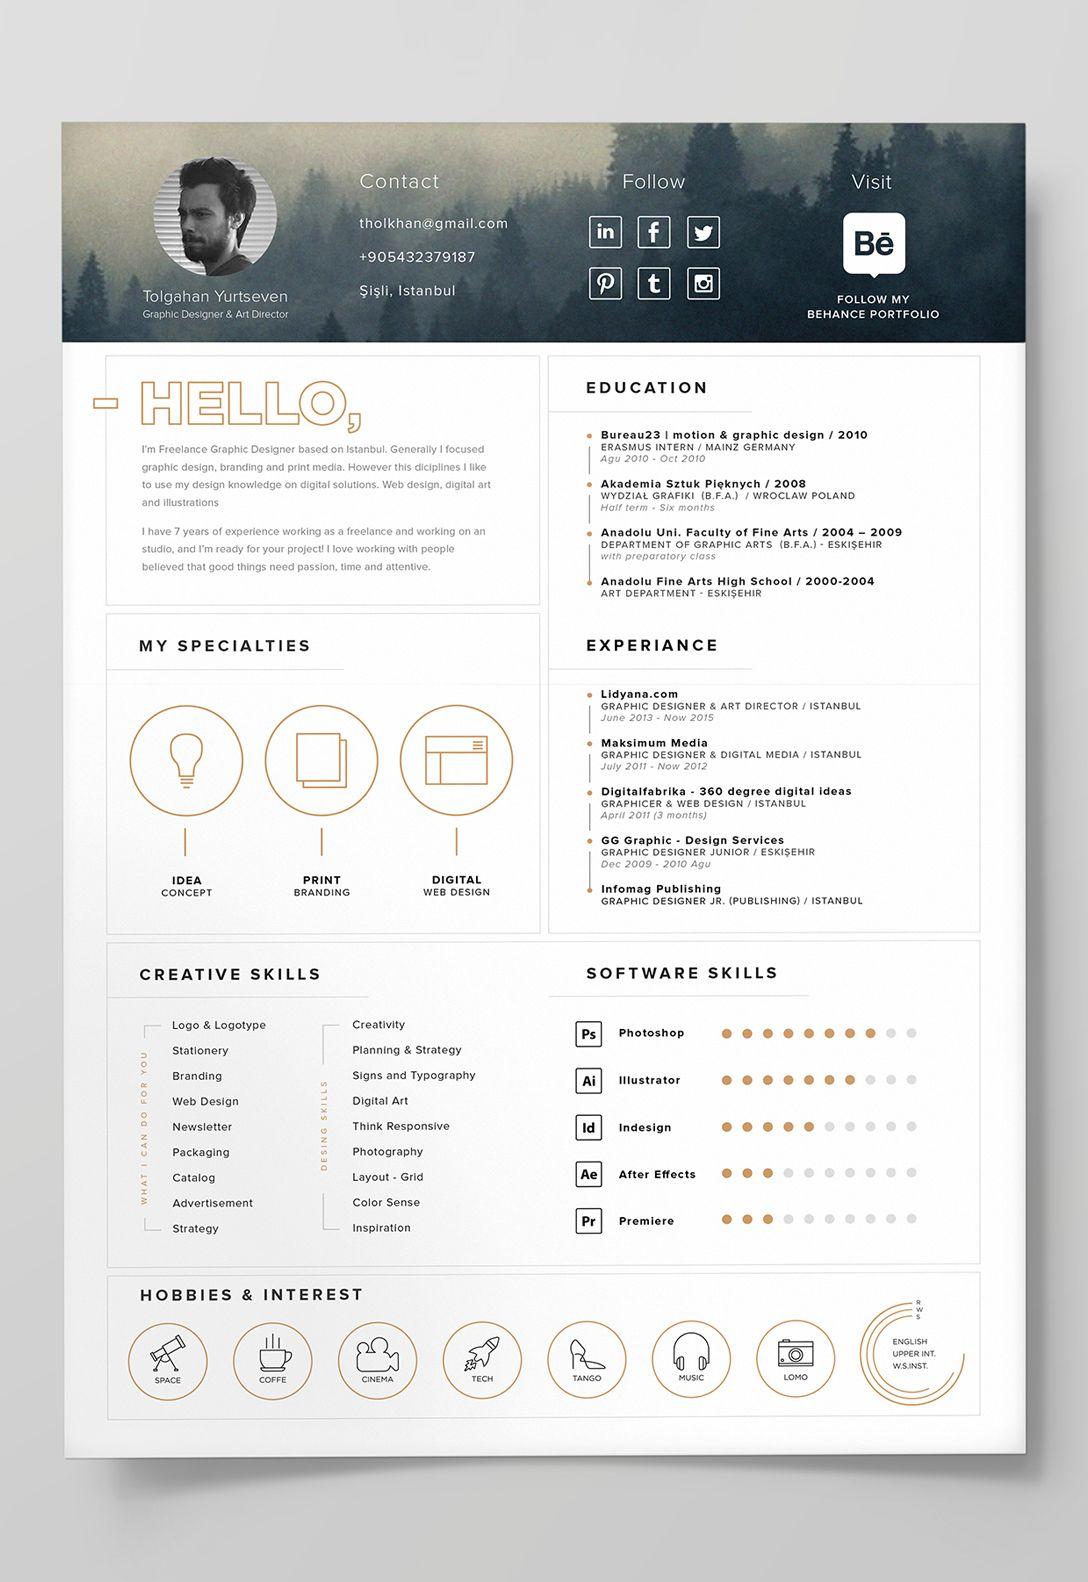 7 Free Editable Minimalist Resume Cv In Adobe Illustrator And Photoshop Format Graphic Design Resume Infographic Resume Template Creative Cv Template